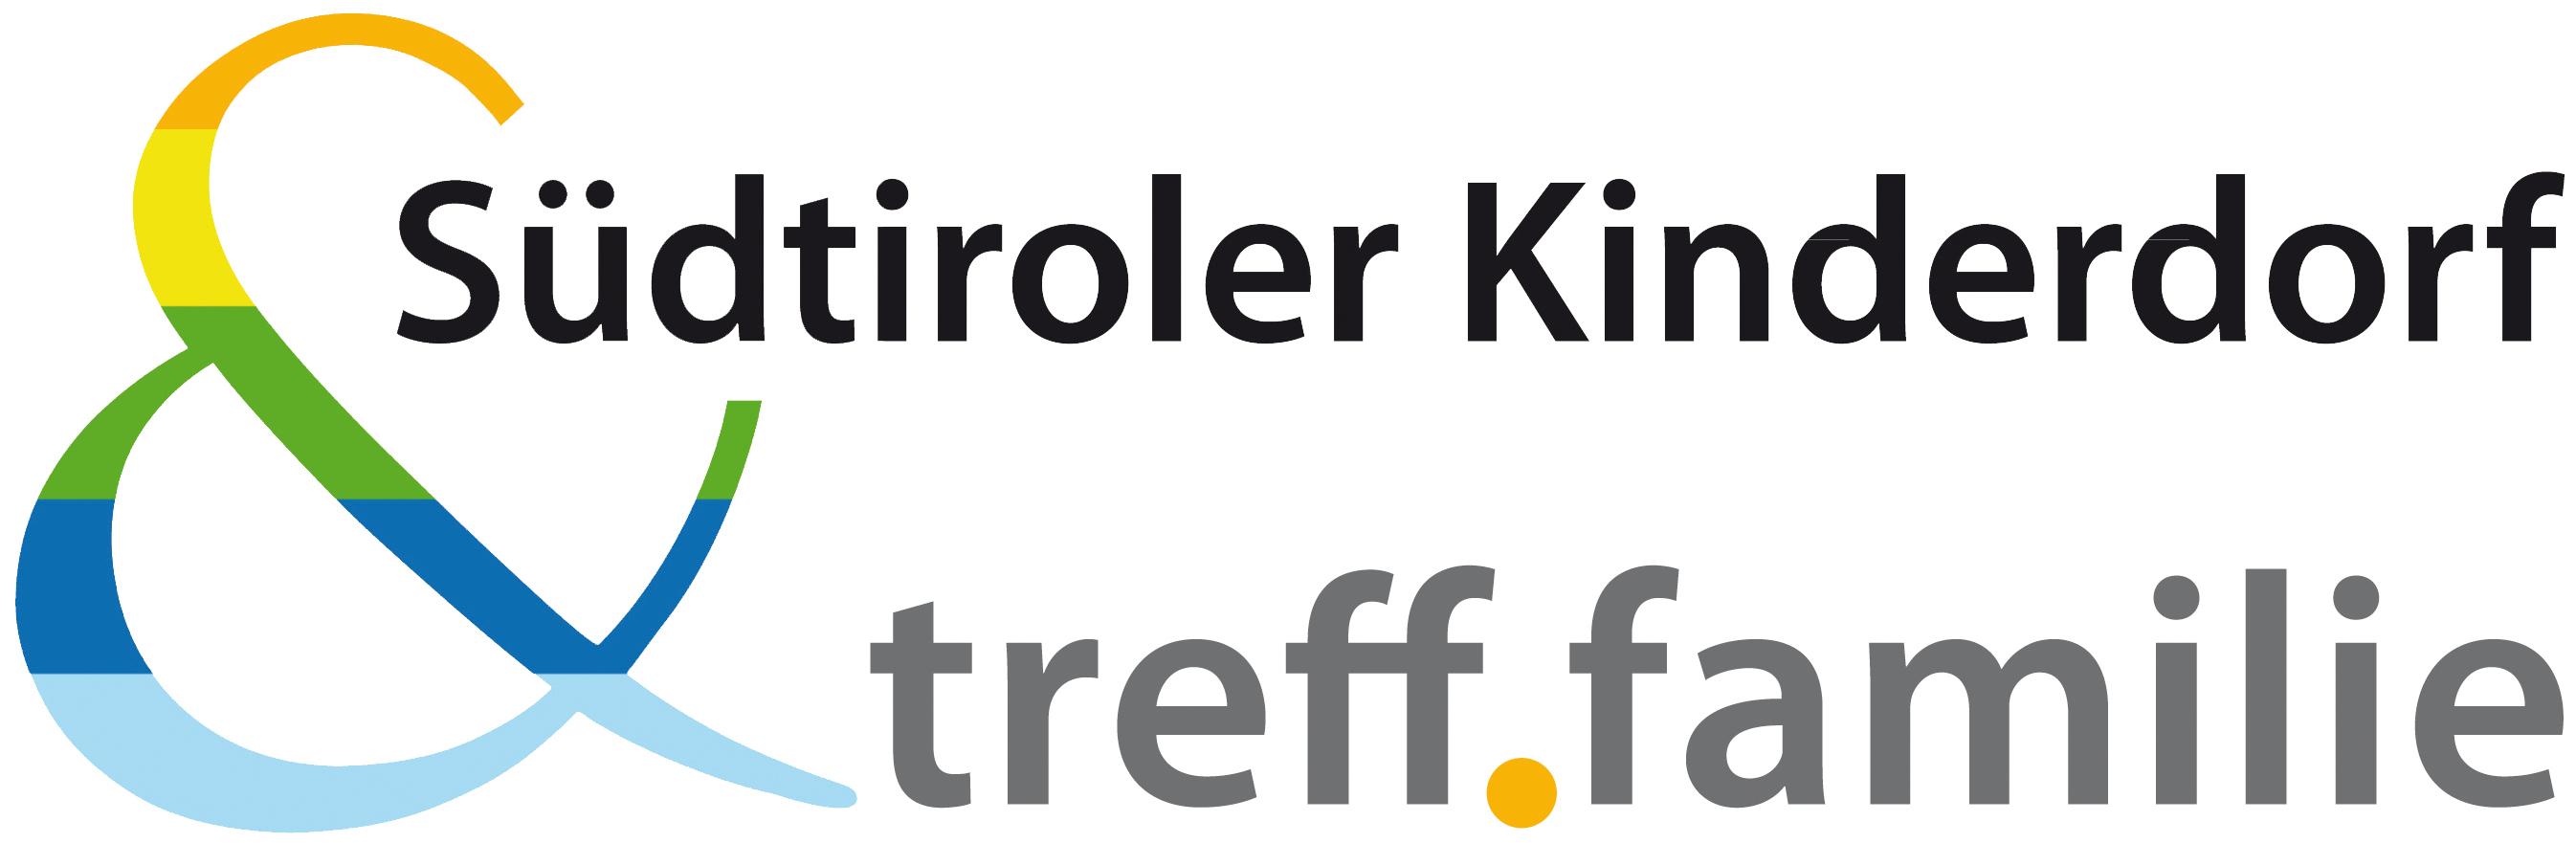 Südtiroler Kinderdorf